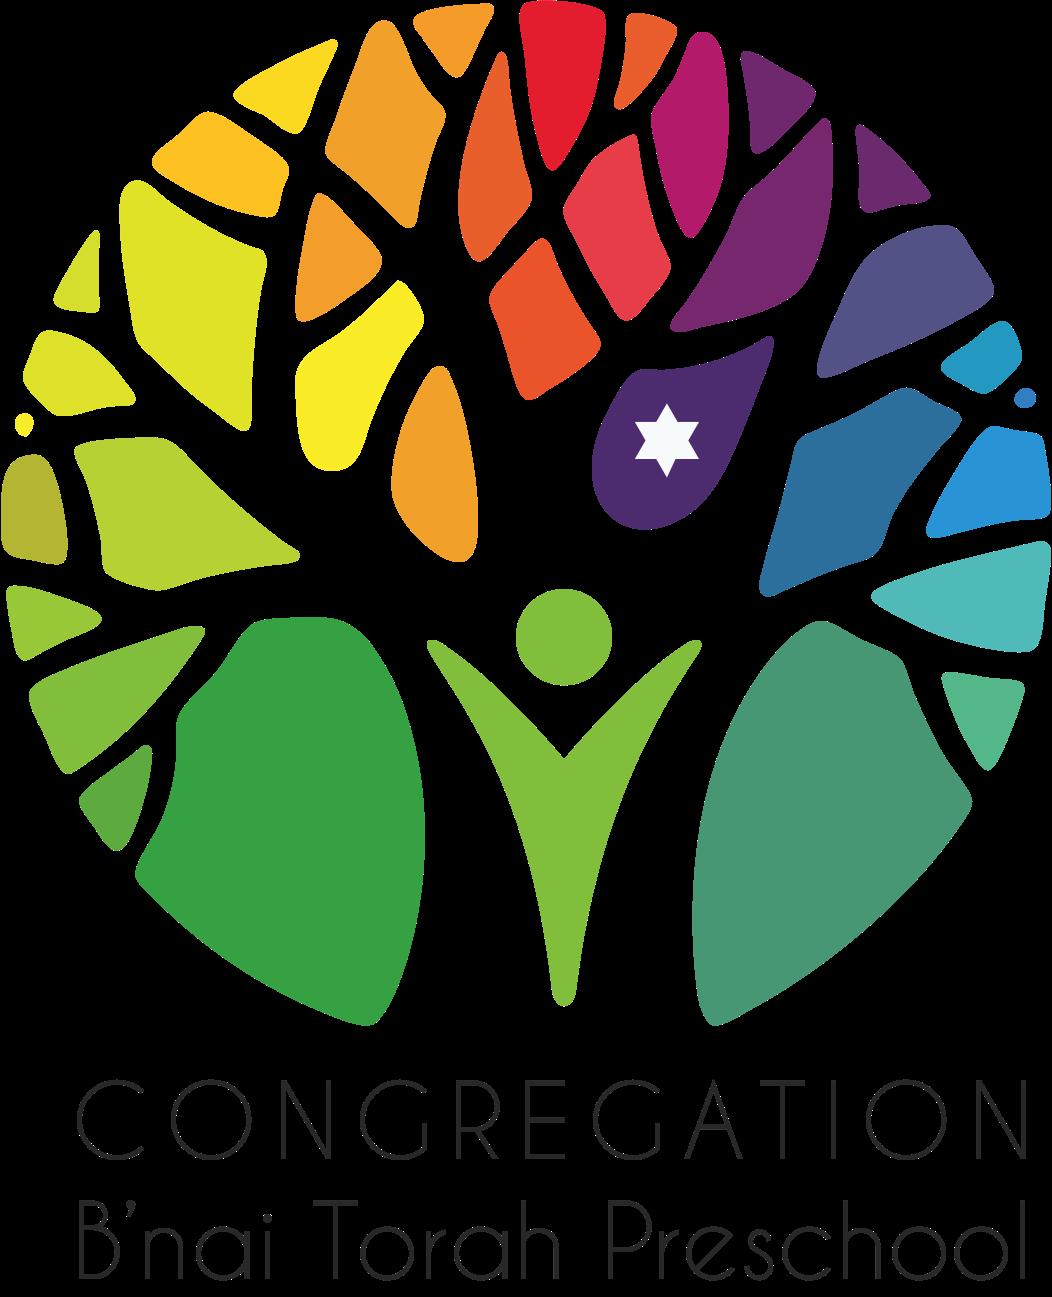 B'nai preschool logo.png